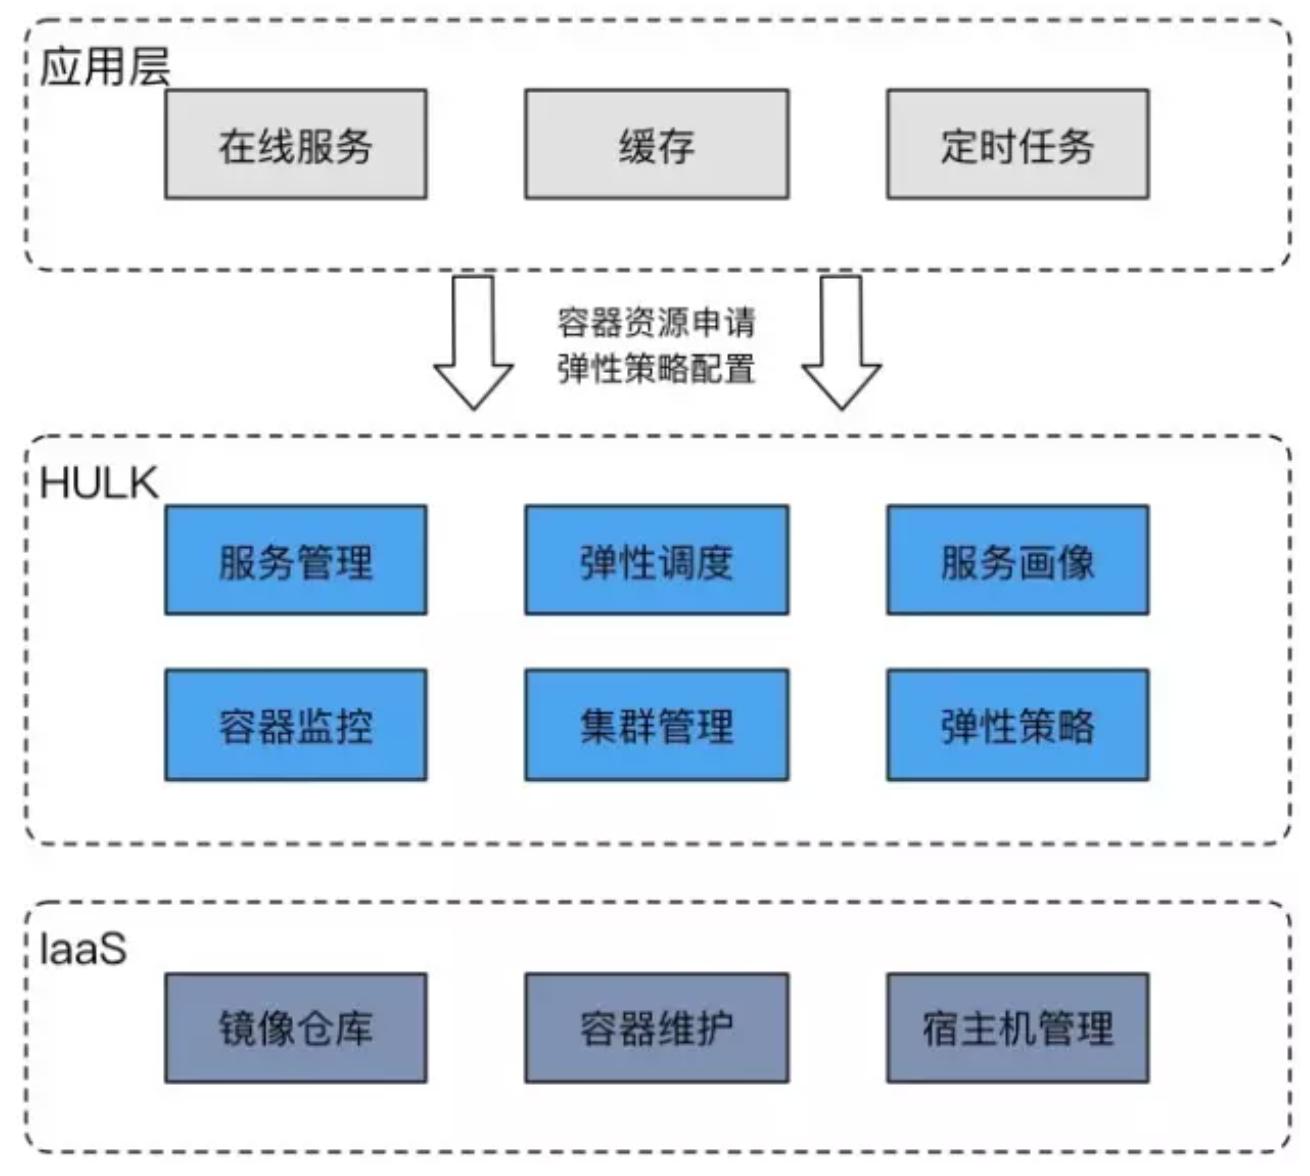 HULK容器平台系统层次图